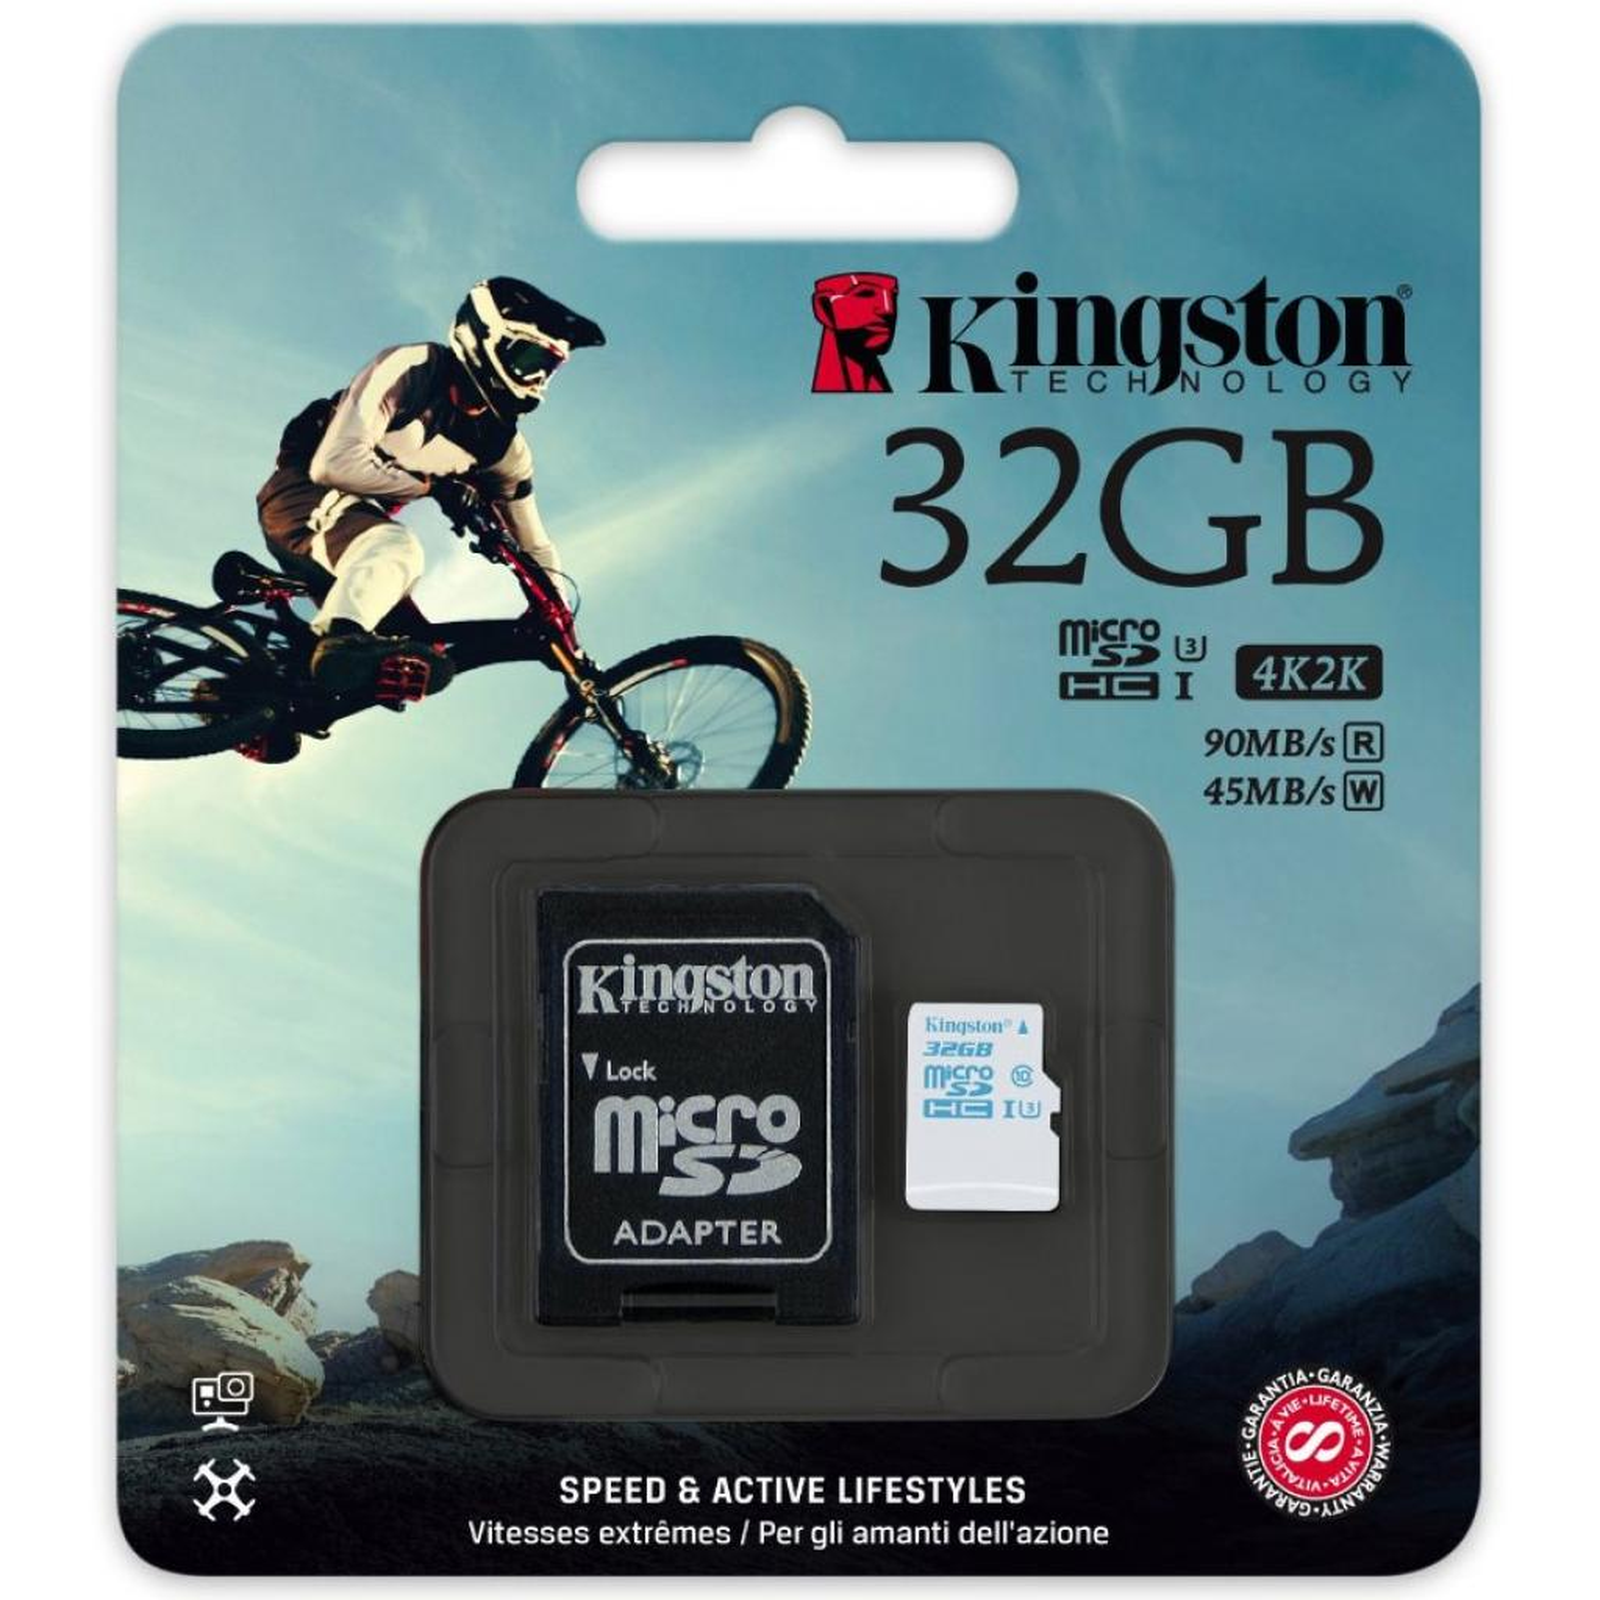 Карта памяти Kingston 32GB microSDHC class 10 UHS-I U3 (SDCAC/32GB) изображение 3